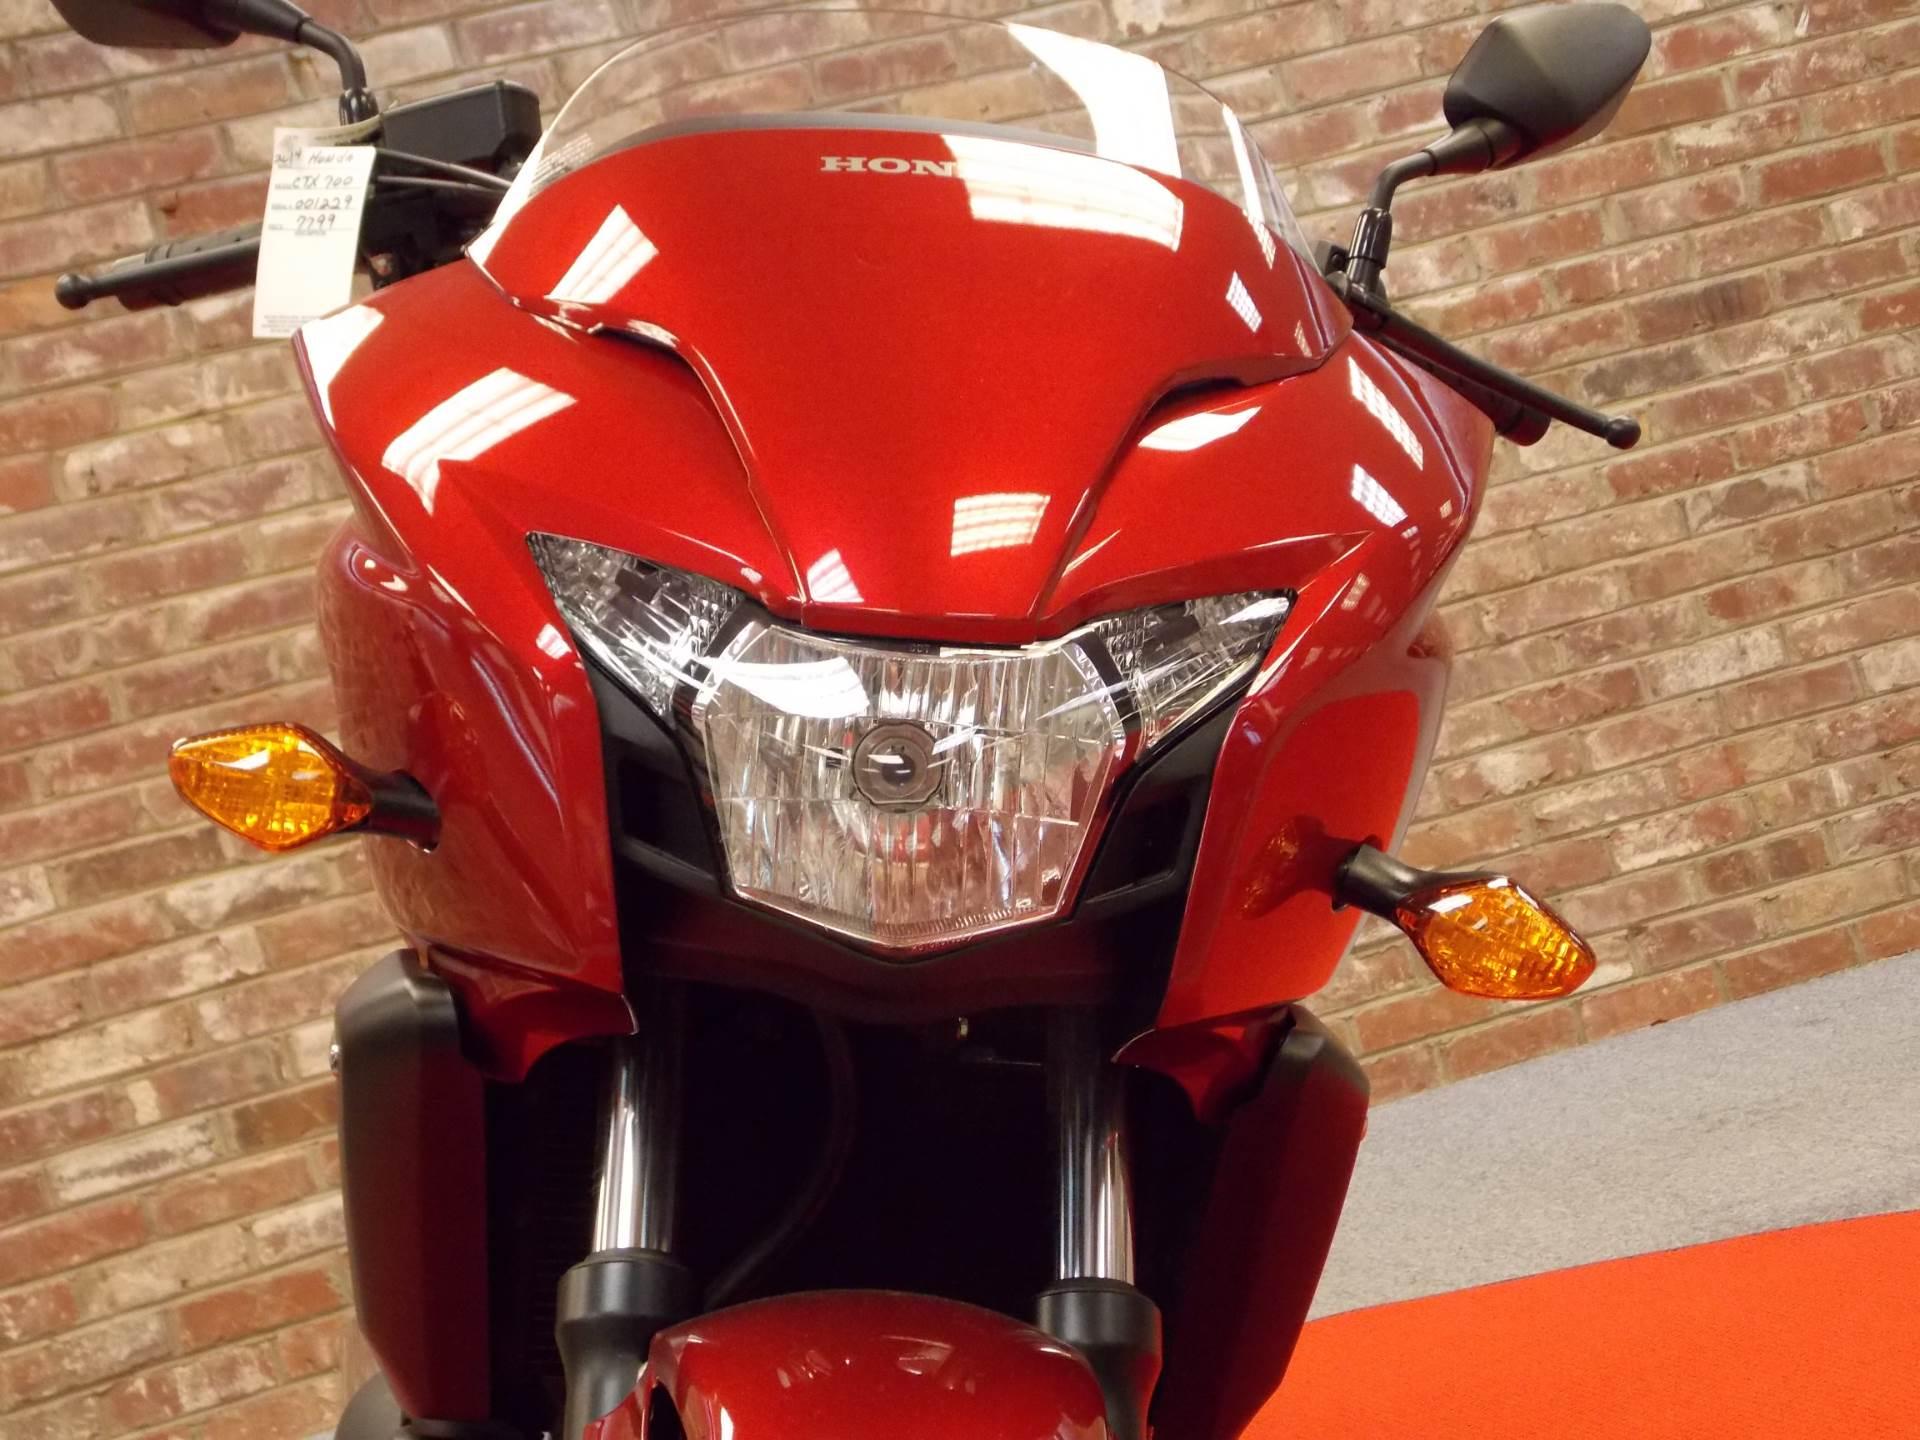 new 2014 honda ctx®700 motorcycles in statesville, nc | stock